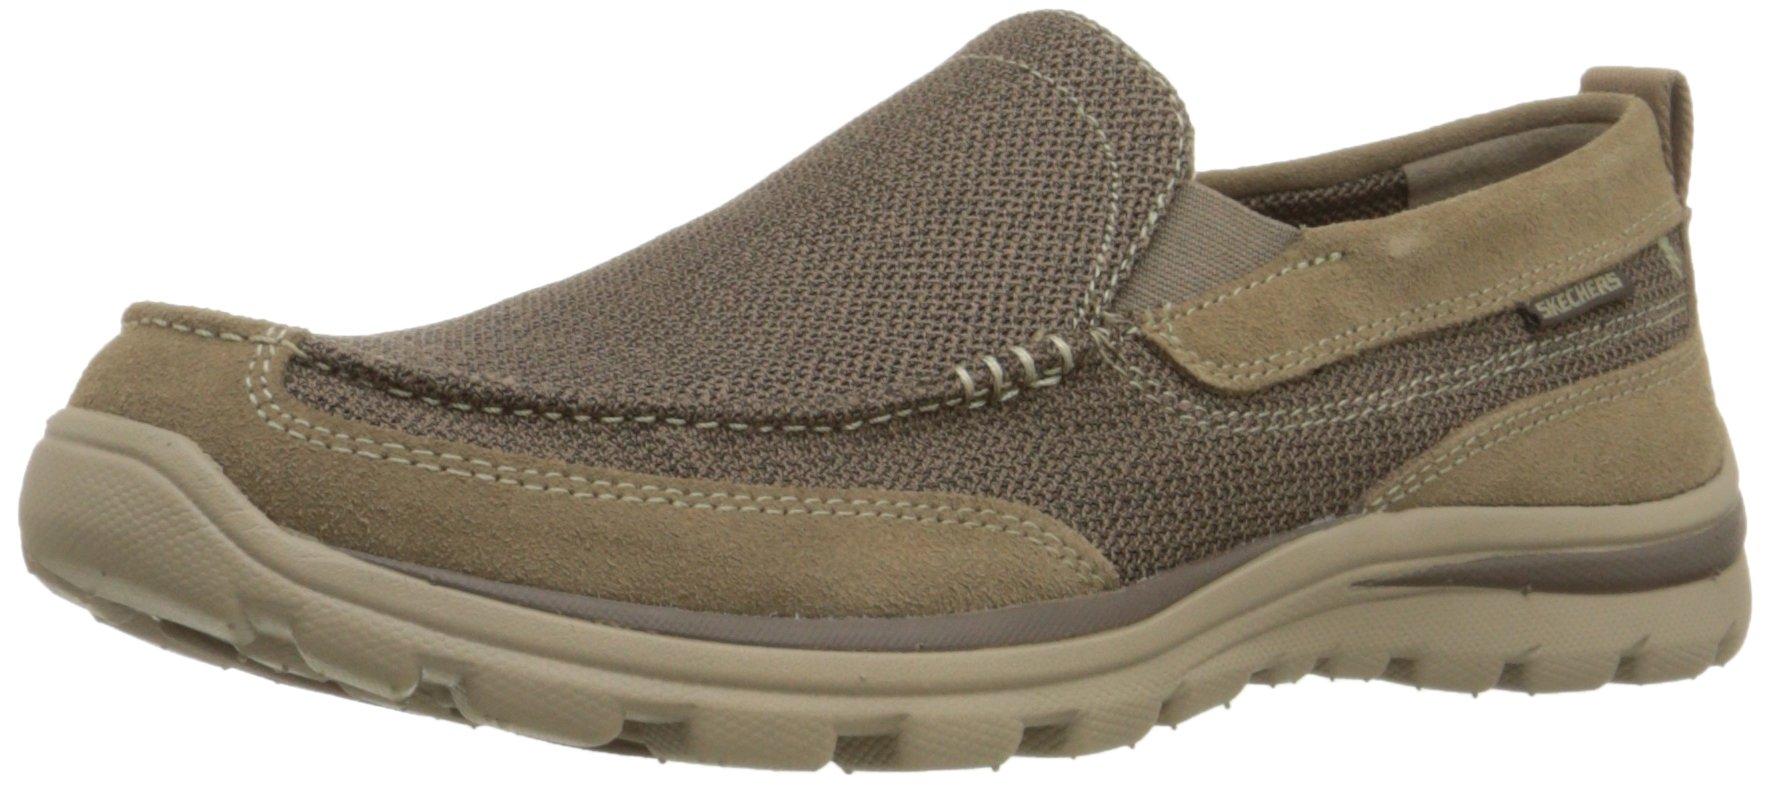 Skechers Men's Superior Milford Slip-On Loafer, Light Brown, 9.5 M US